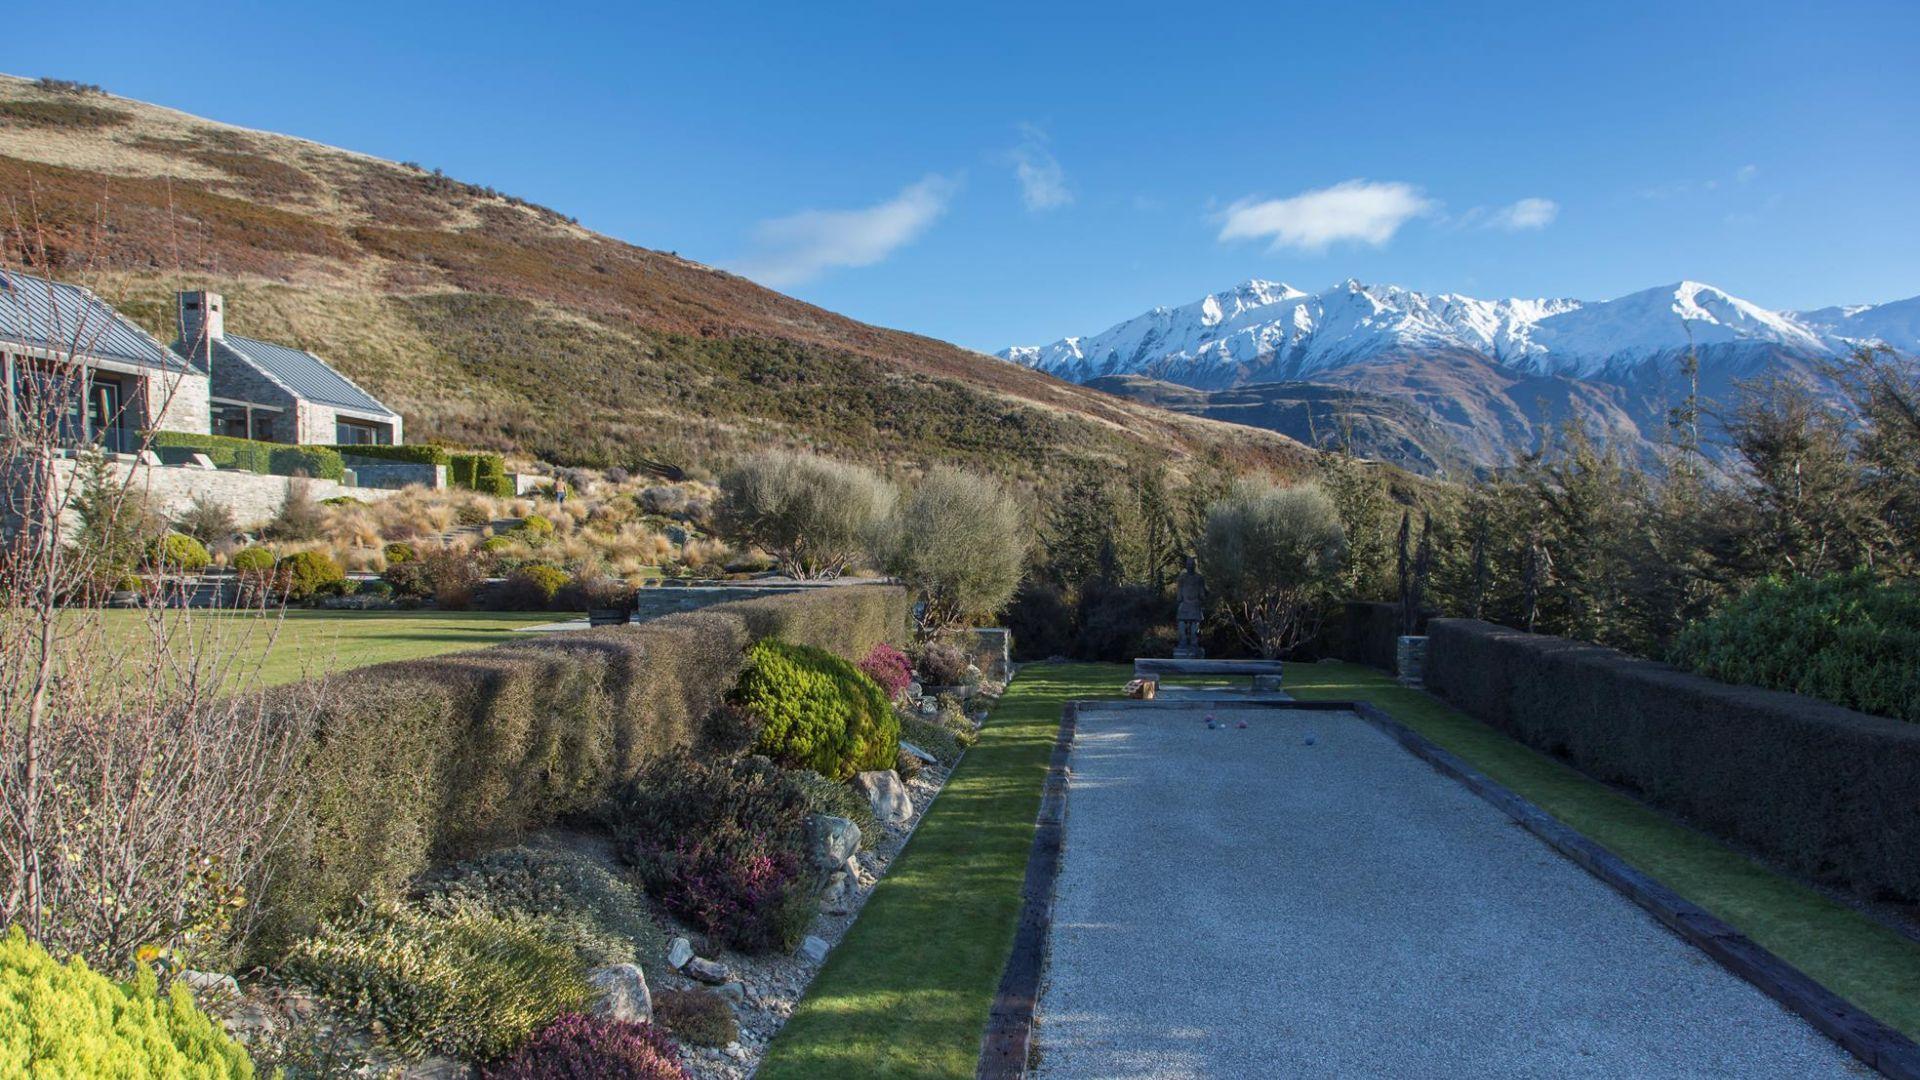 Piwakawaka Luxury Wanaka Villa Looks Like A Pentaque Court Is